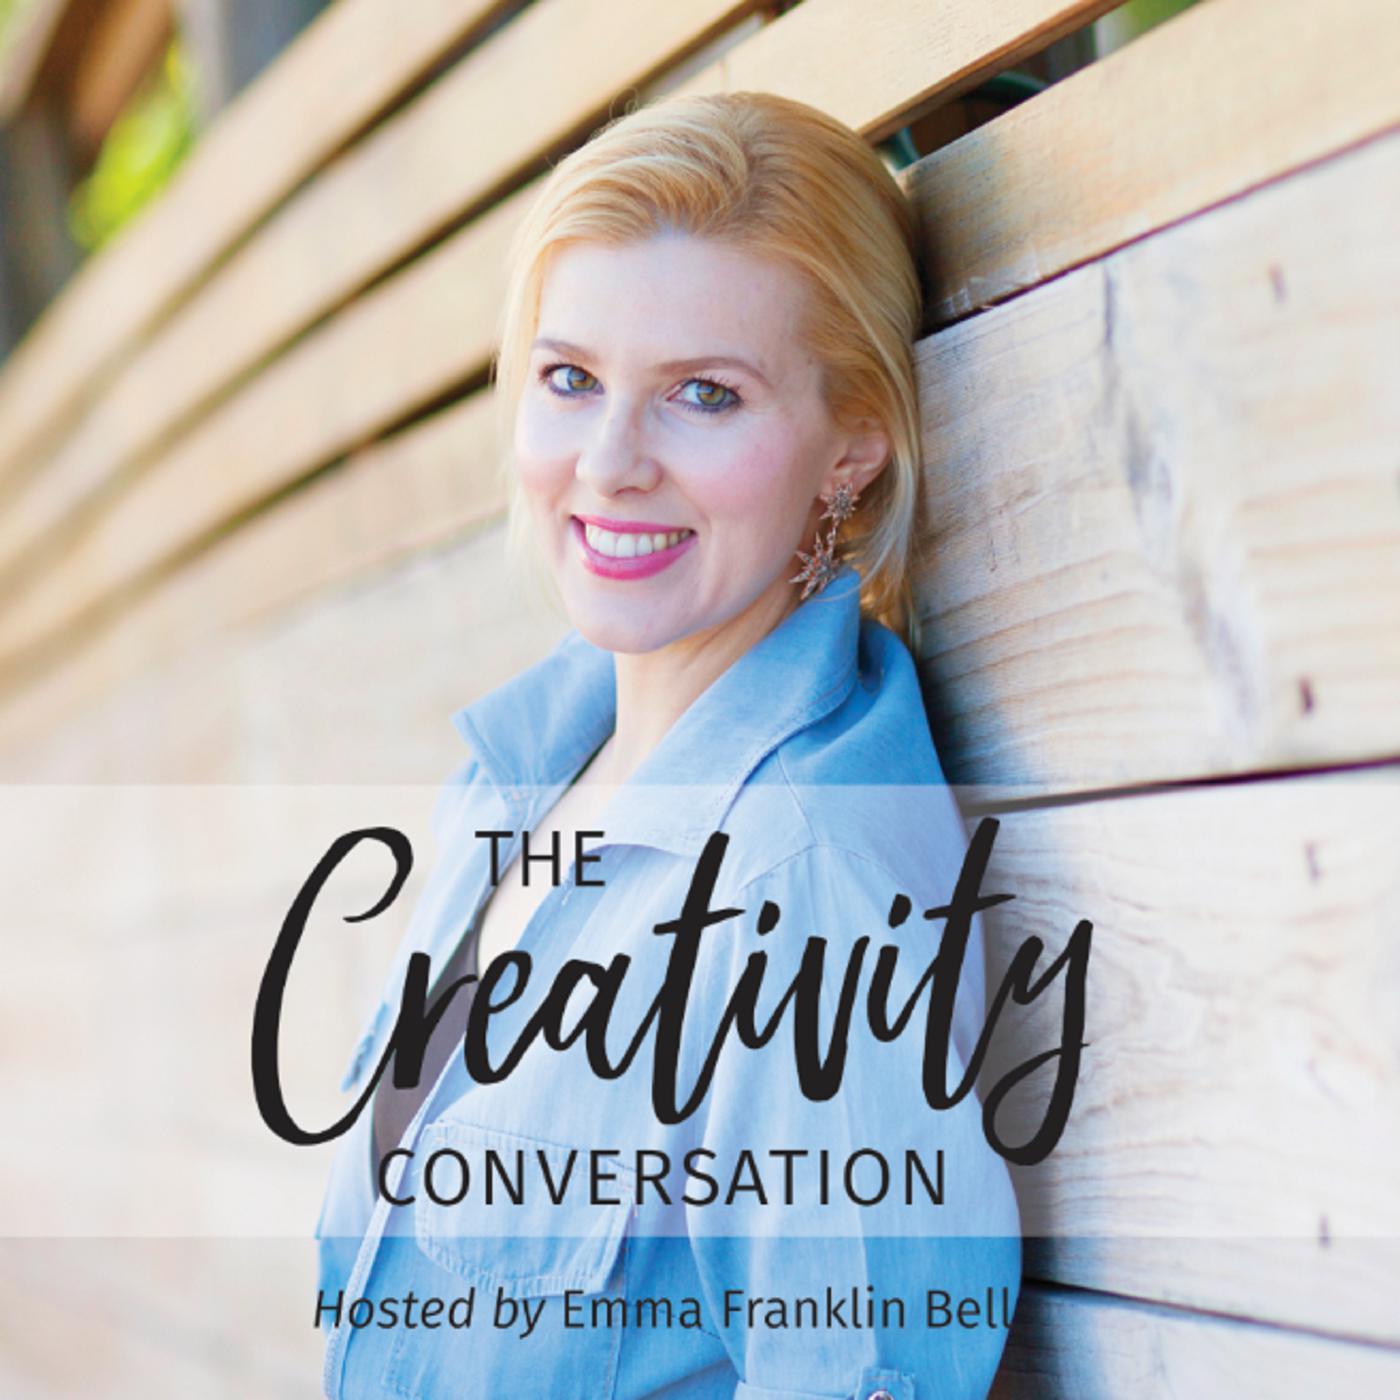 The Creativity Conversation (podcast) - Emma Franklin Bell: Founder